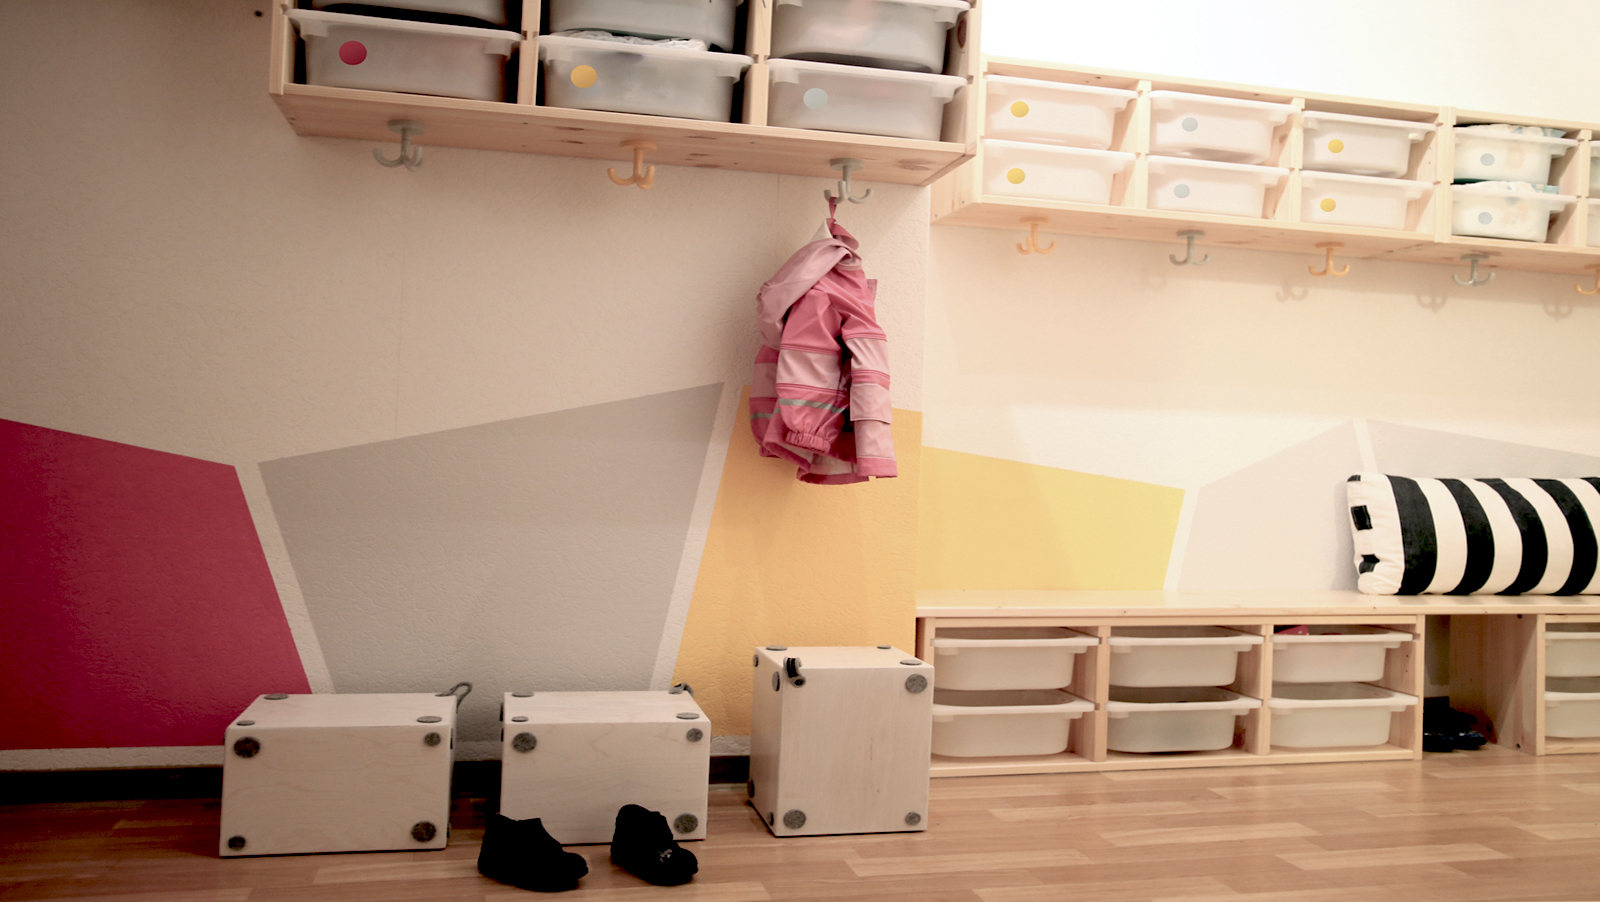 Raumgestaltung Kita 30 Epic Examples Of Inspirational Classroom Decor